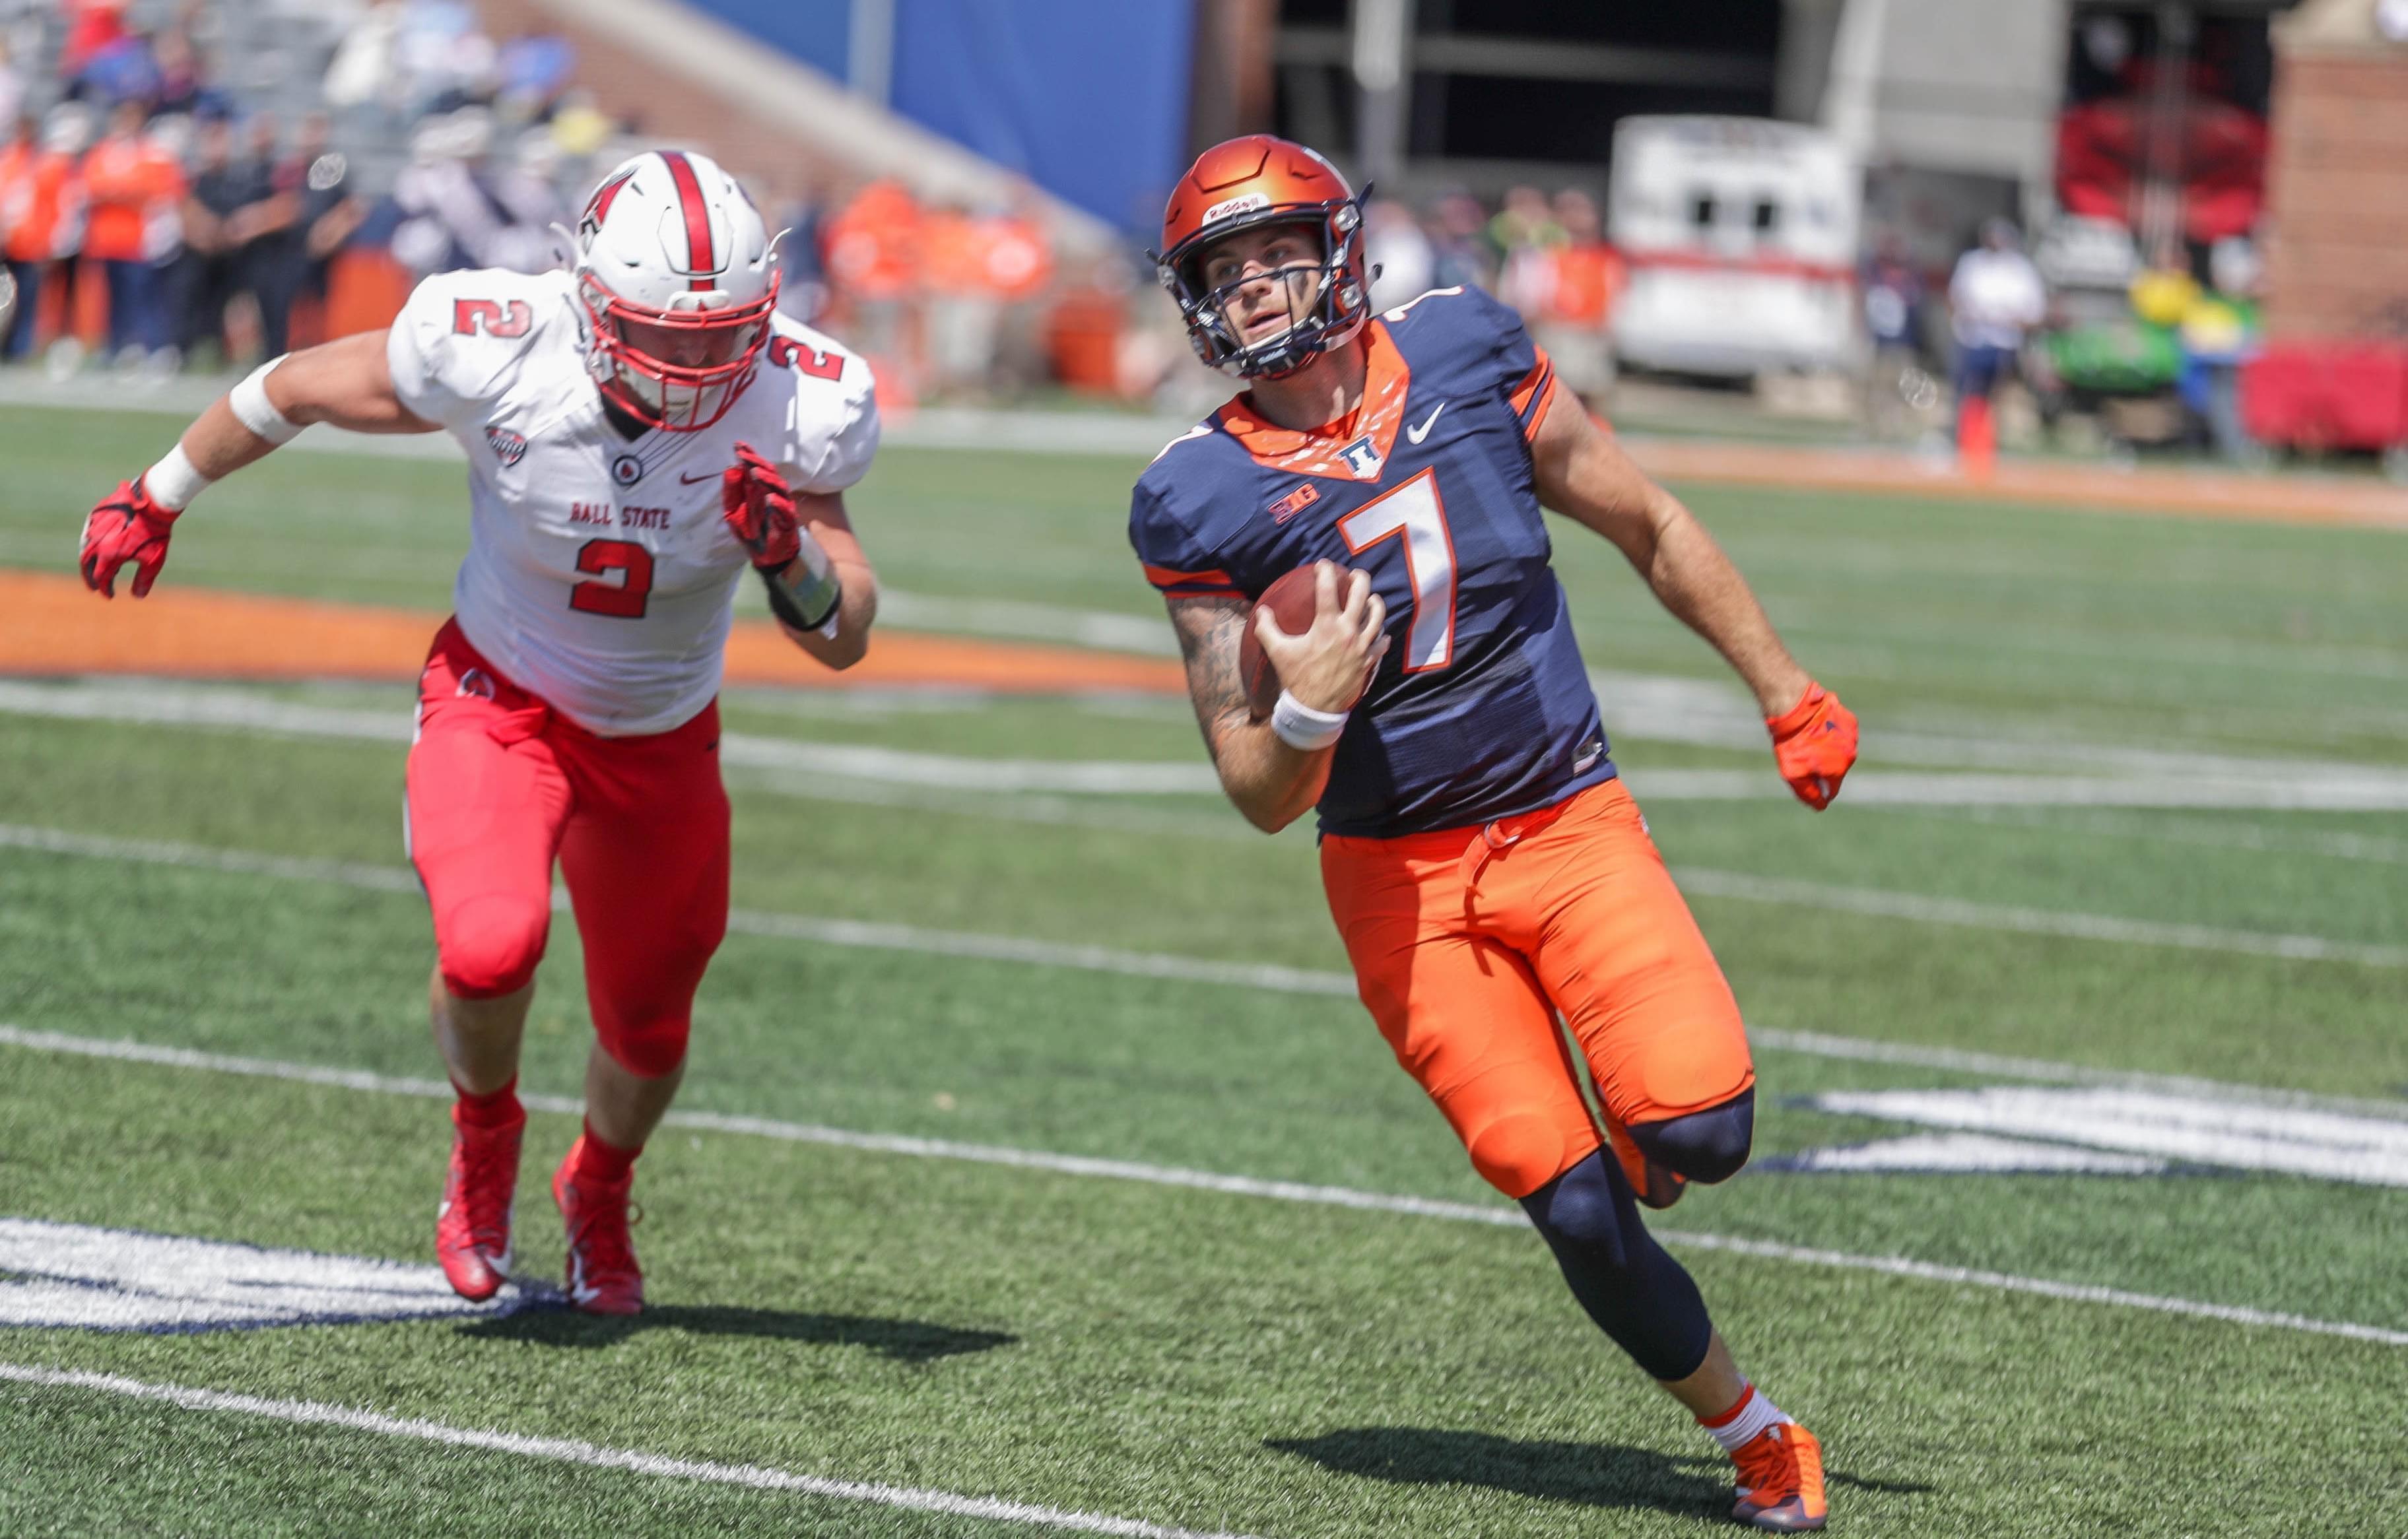 Illinois quarterback Chayce Crouch